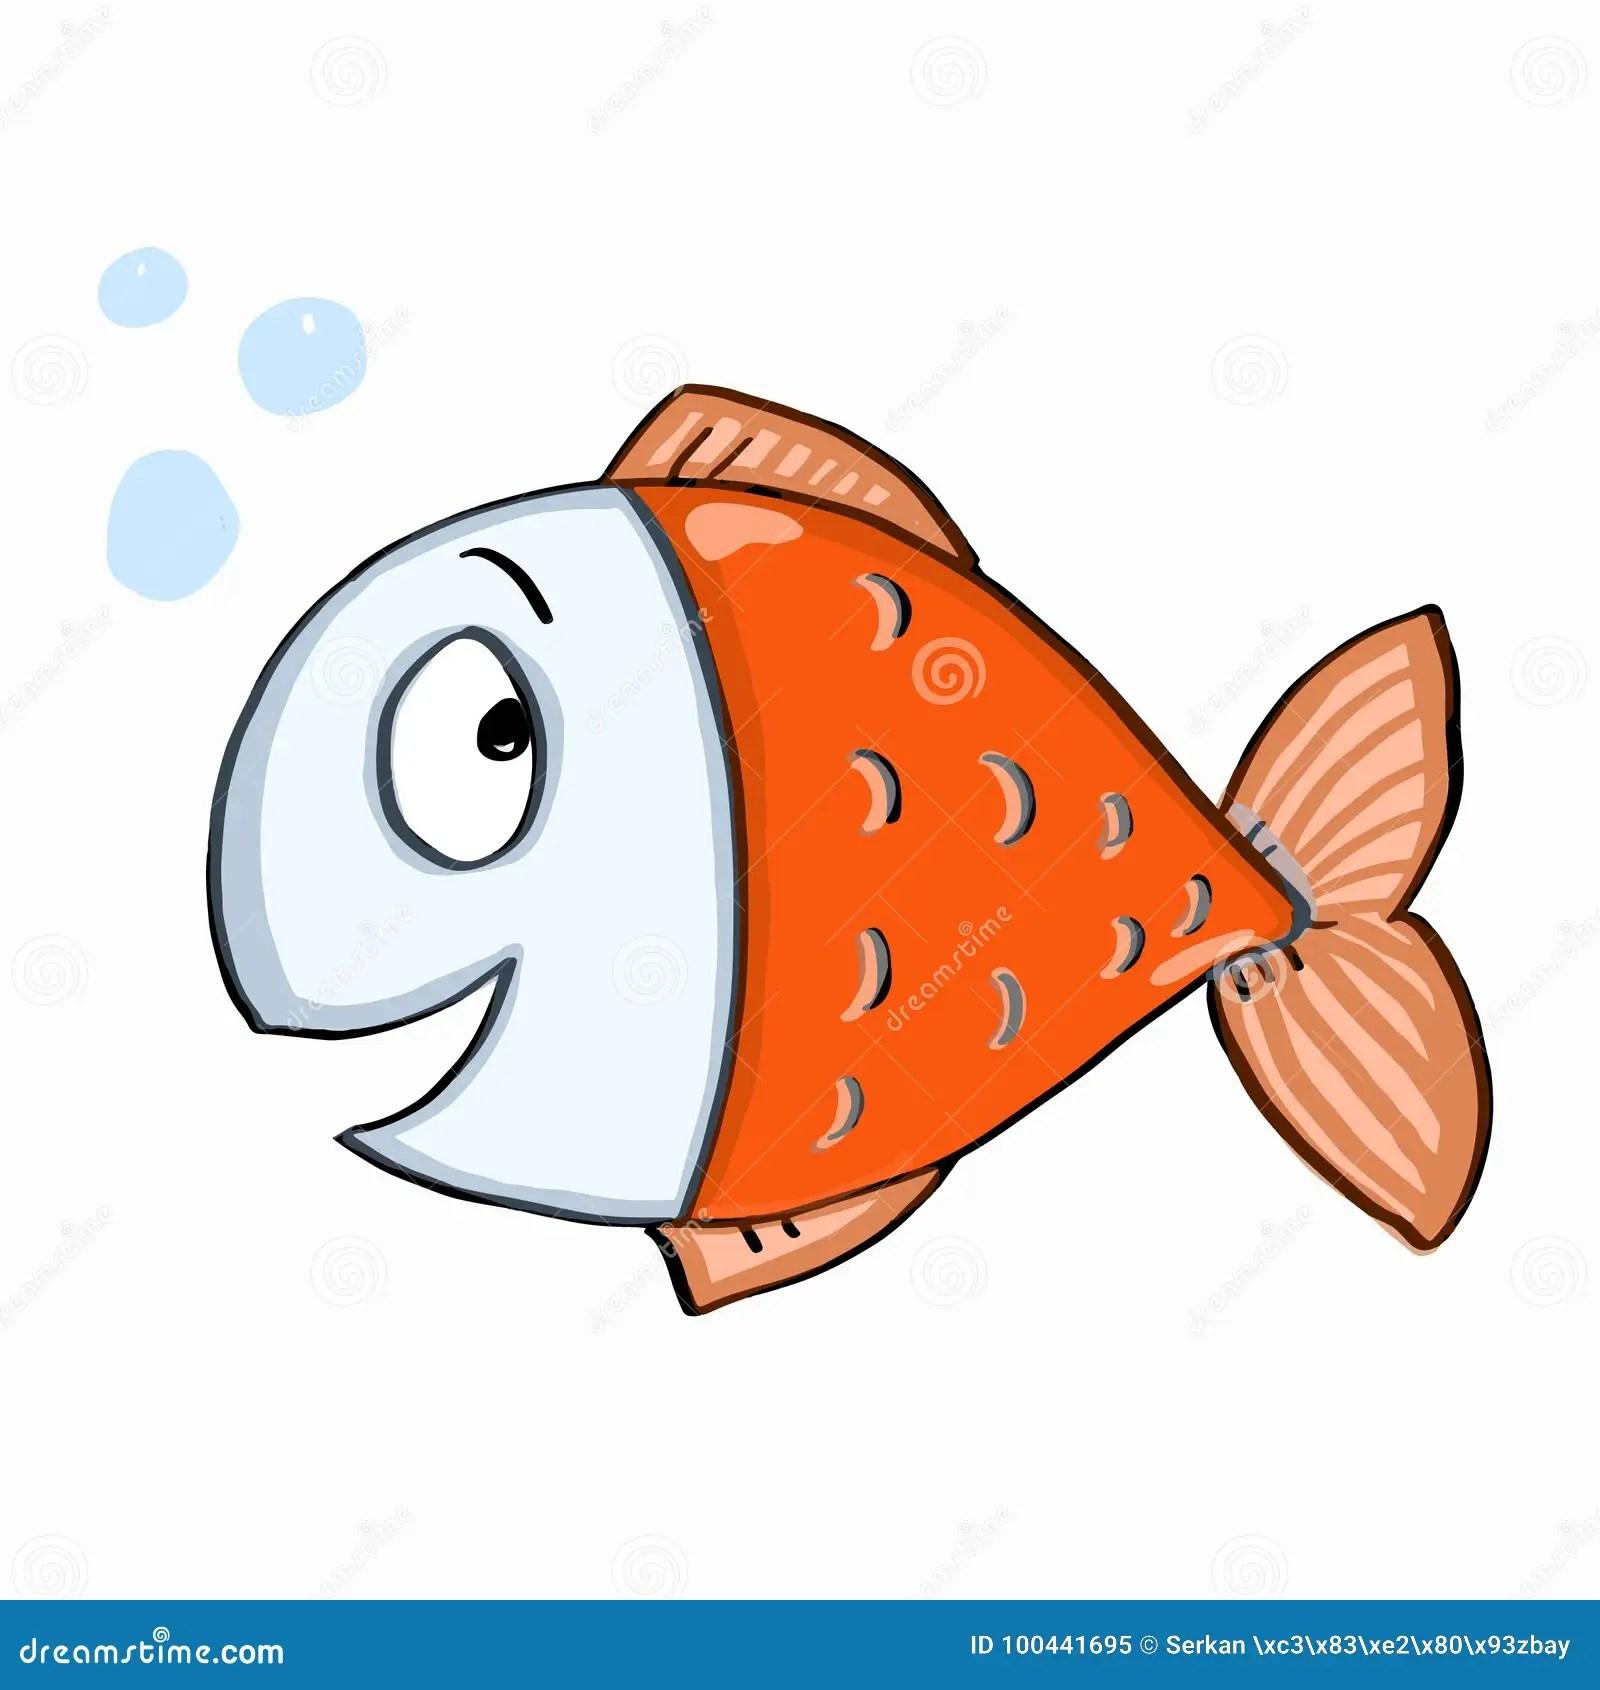 Cute Fish Colour Stock Vector Illustration Of Elephant